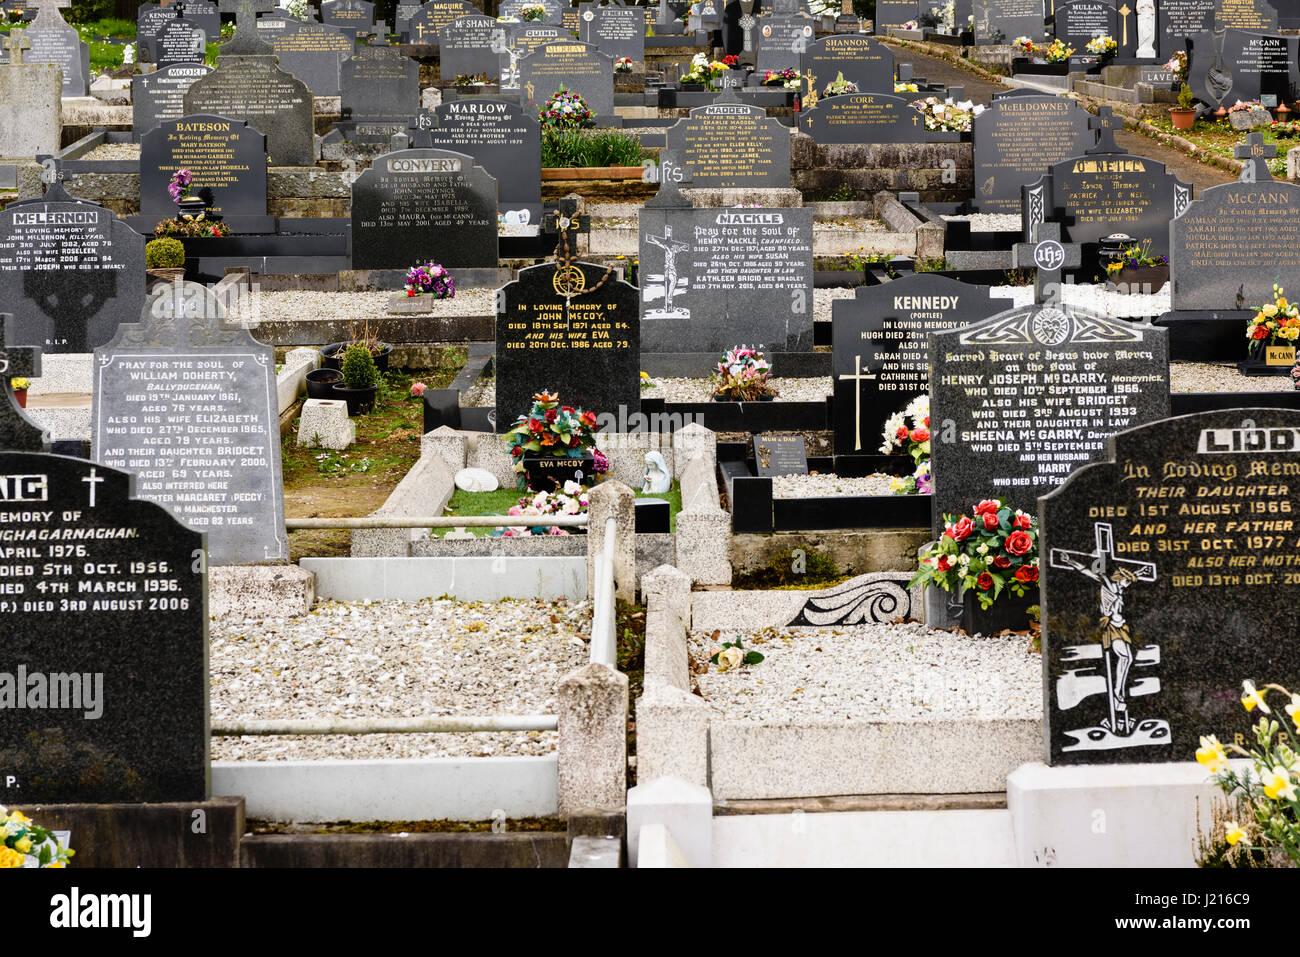 Gravestones at a Roman Catholic church graveyard Stock Photo